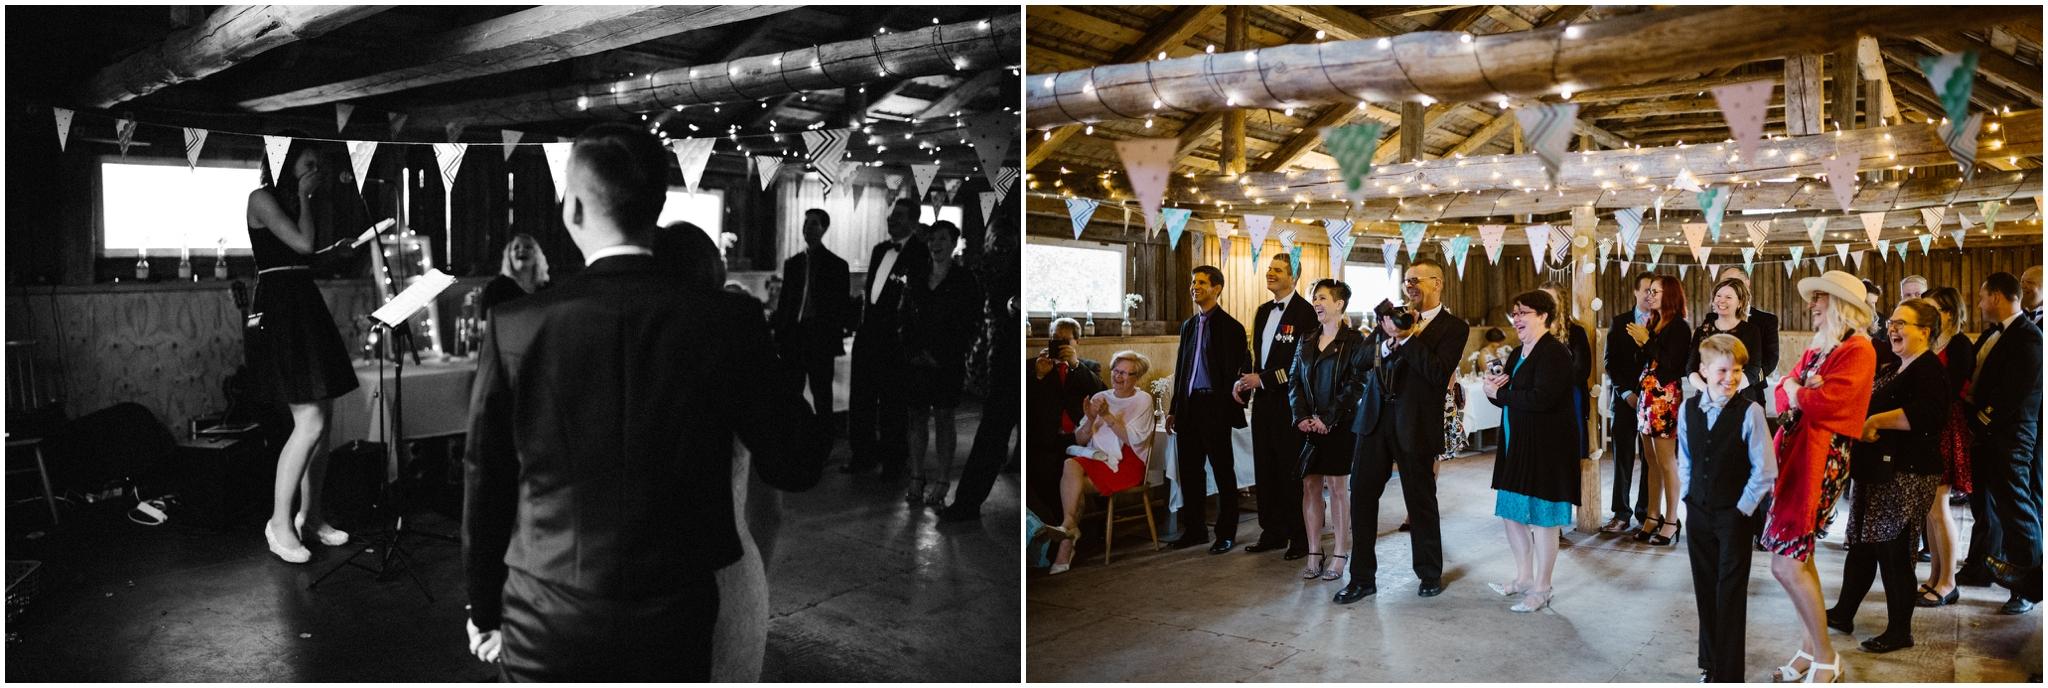 Pinja + Marko -- Patrick Karkkolainen Wedding Photographer-155.jpg